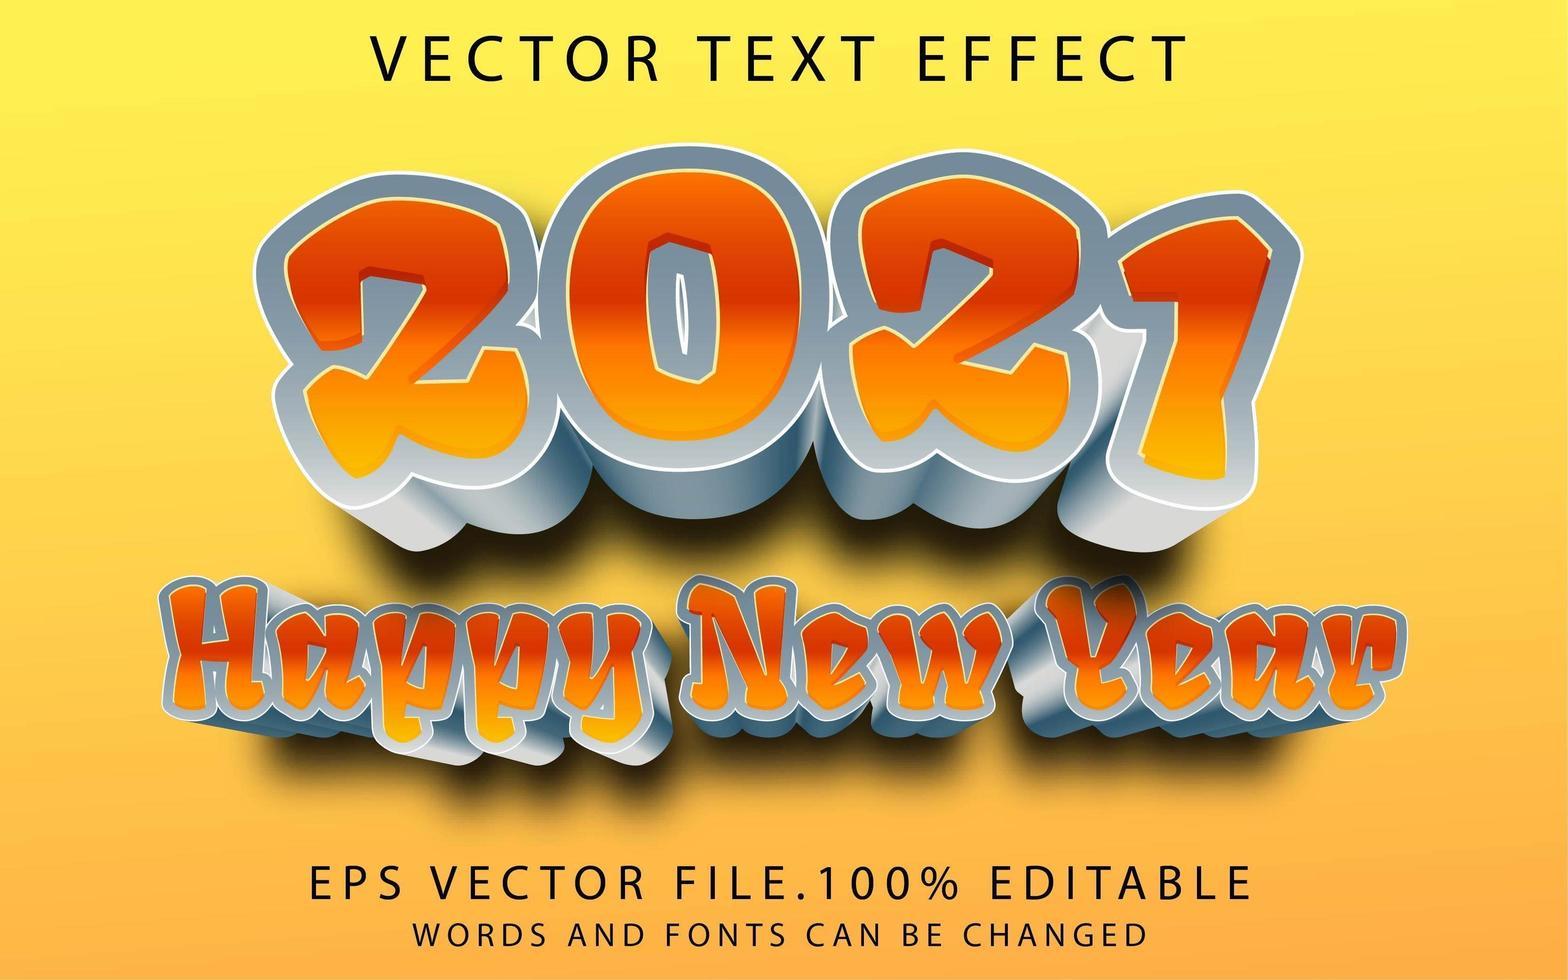 texteffekt gott nytt år vektor